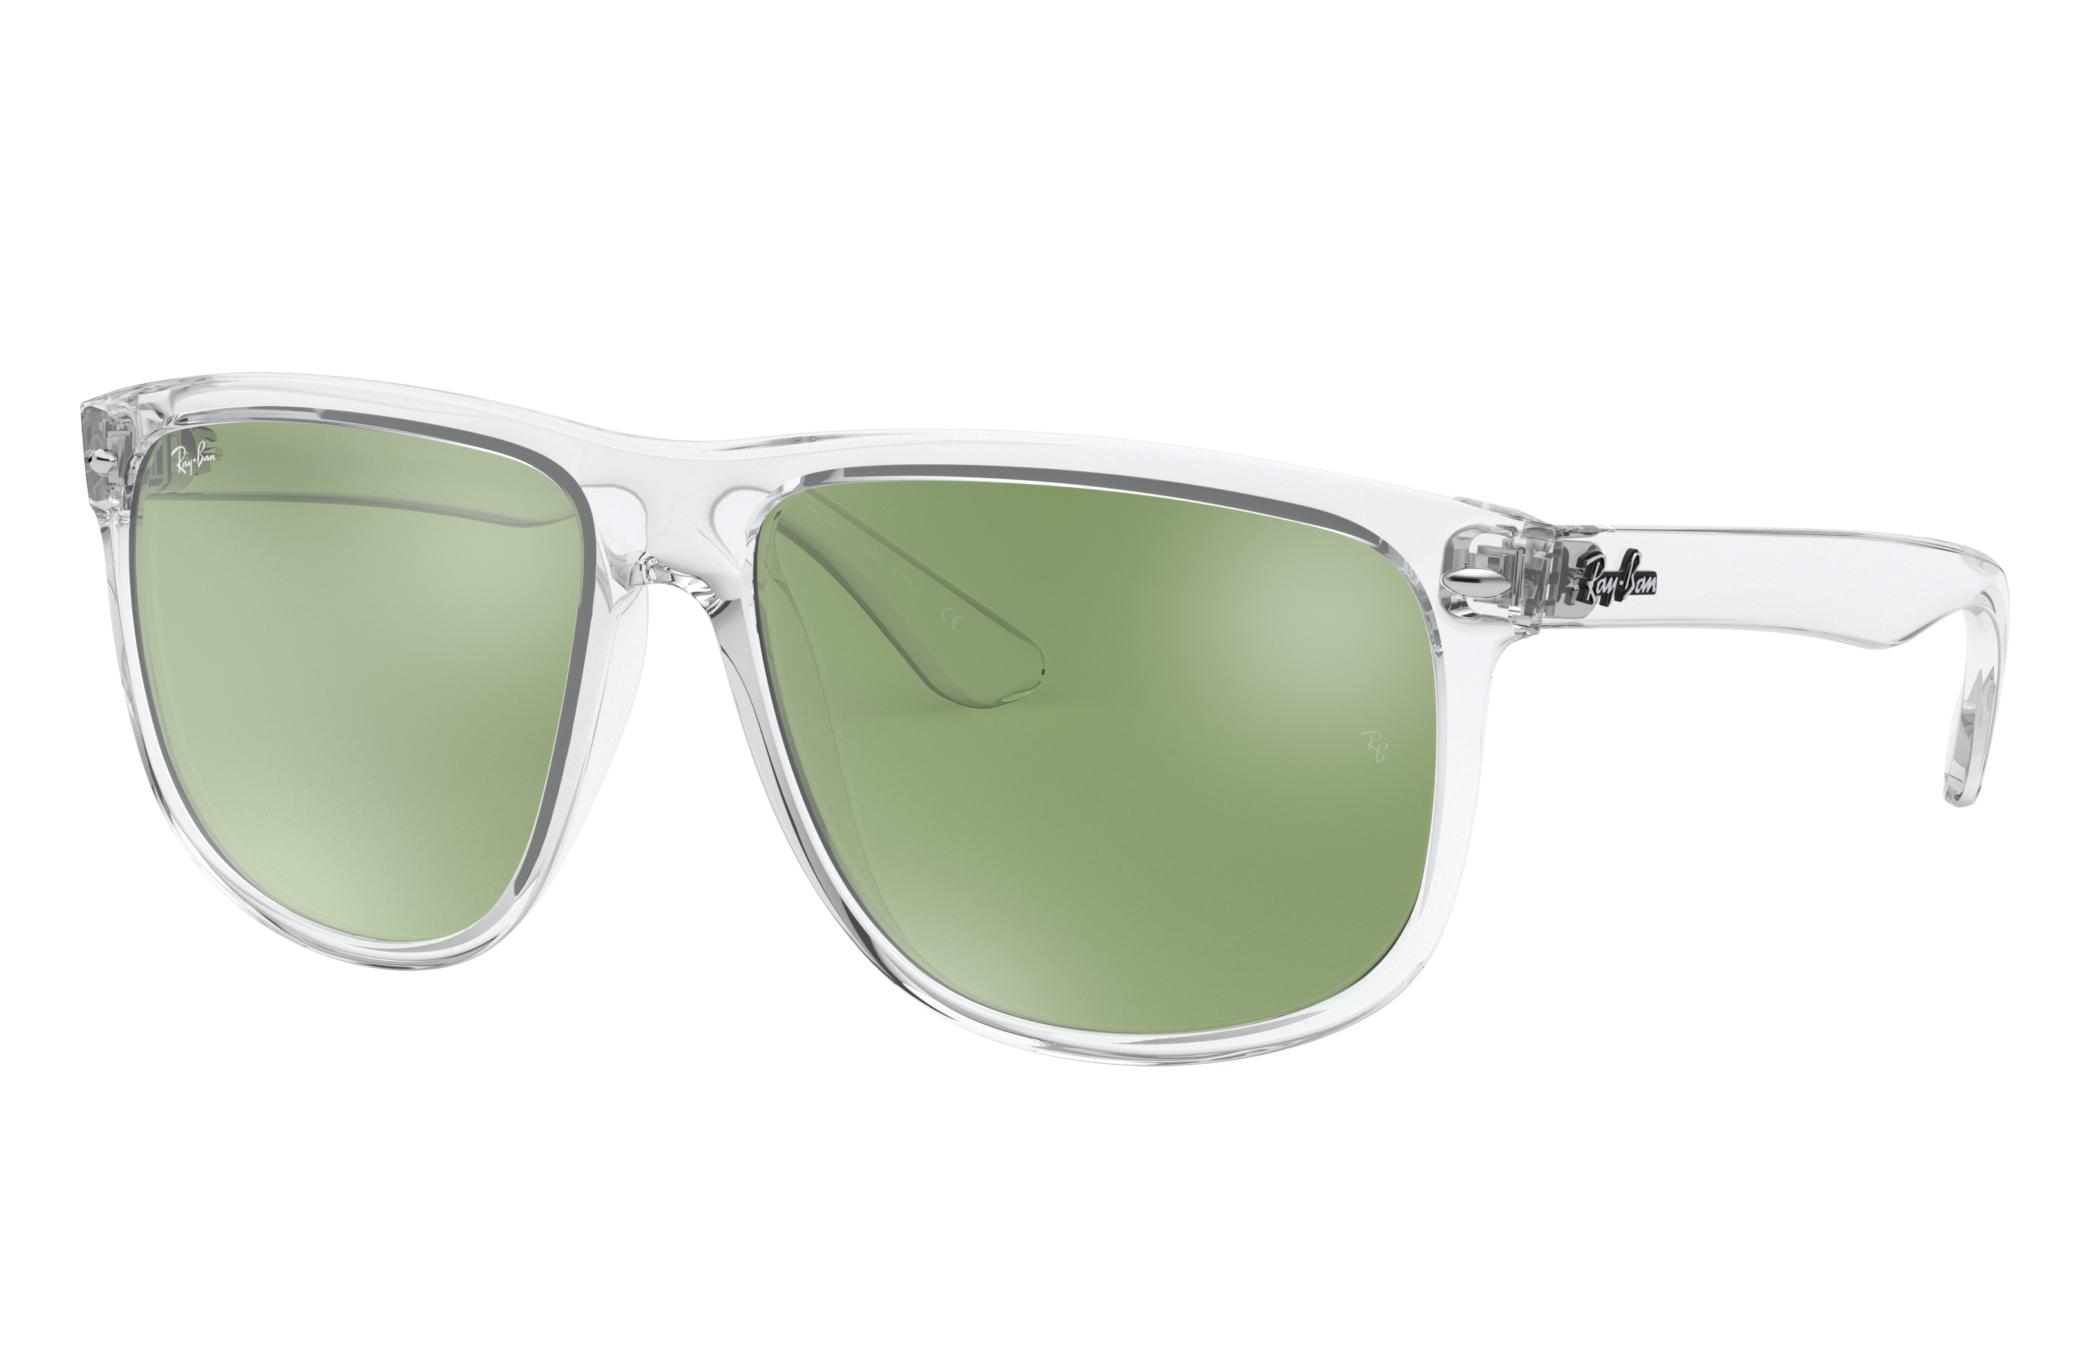 Ray-Ban Rb4147 Transparent, Green Lenses - RB4147